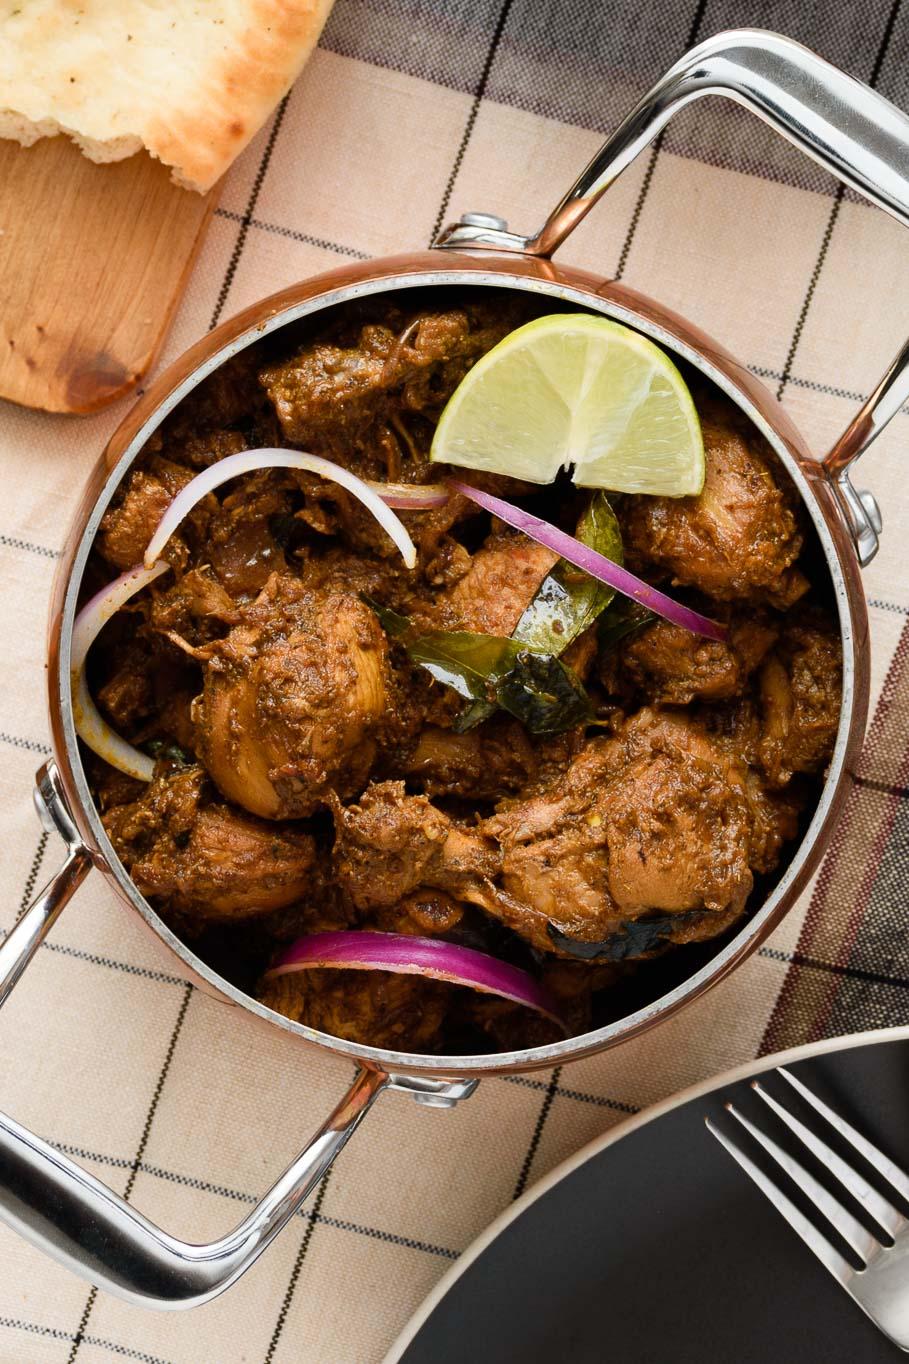 Pepper Chicken - Pepper Delight #pepperdelightblog #recipe #pepperchicken #chicken #nadan #murghkalimirch #kerala #chickendryroast #chickenroast #chickencurry #christmas #easter #christianrecipes #pepper #spicy #indian